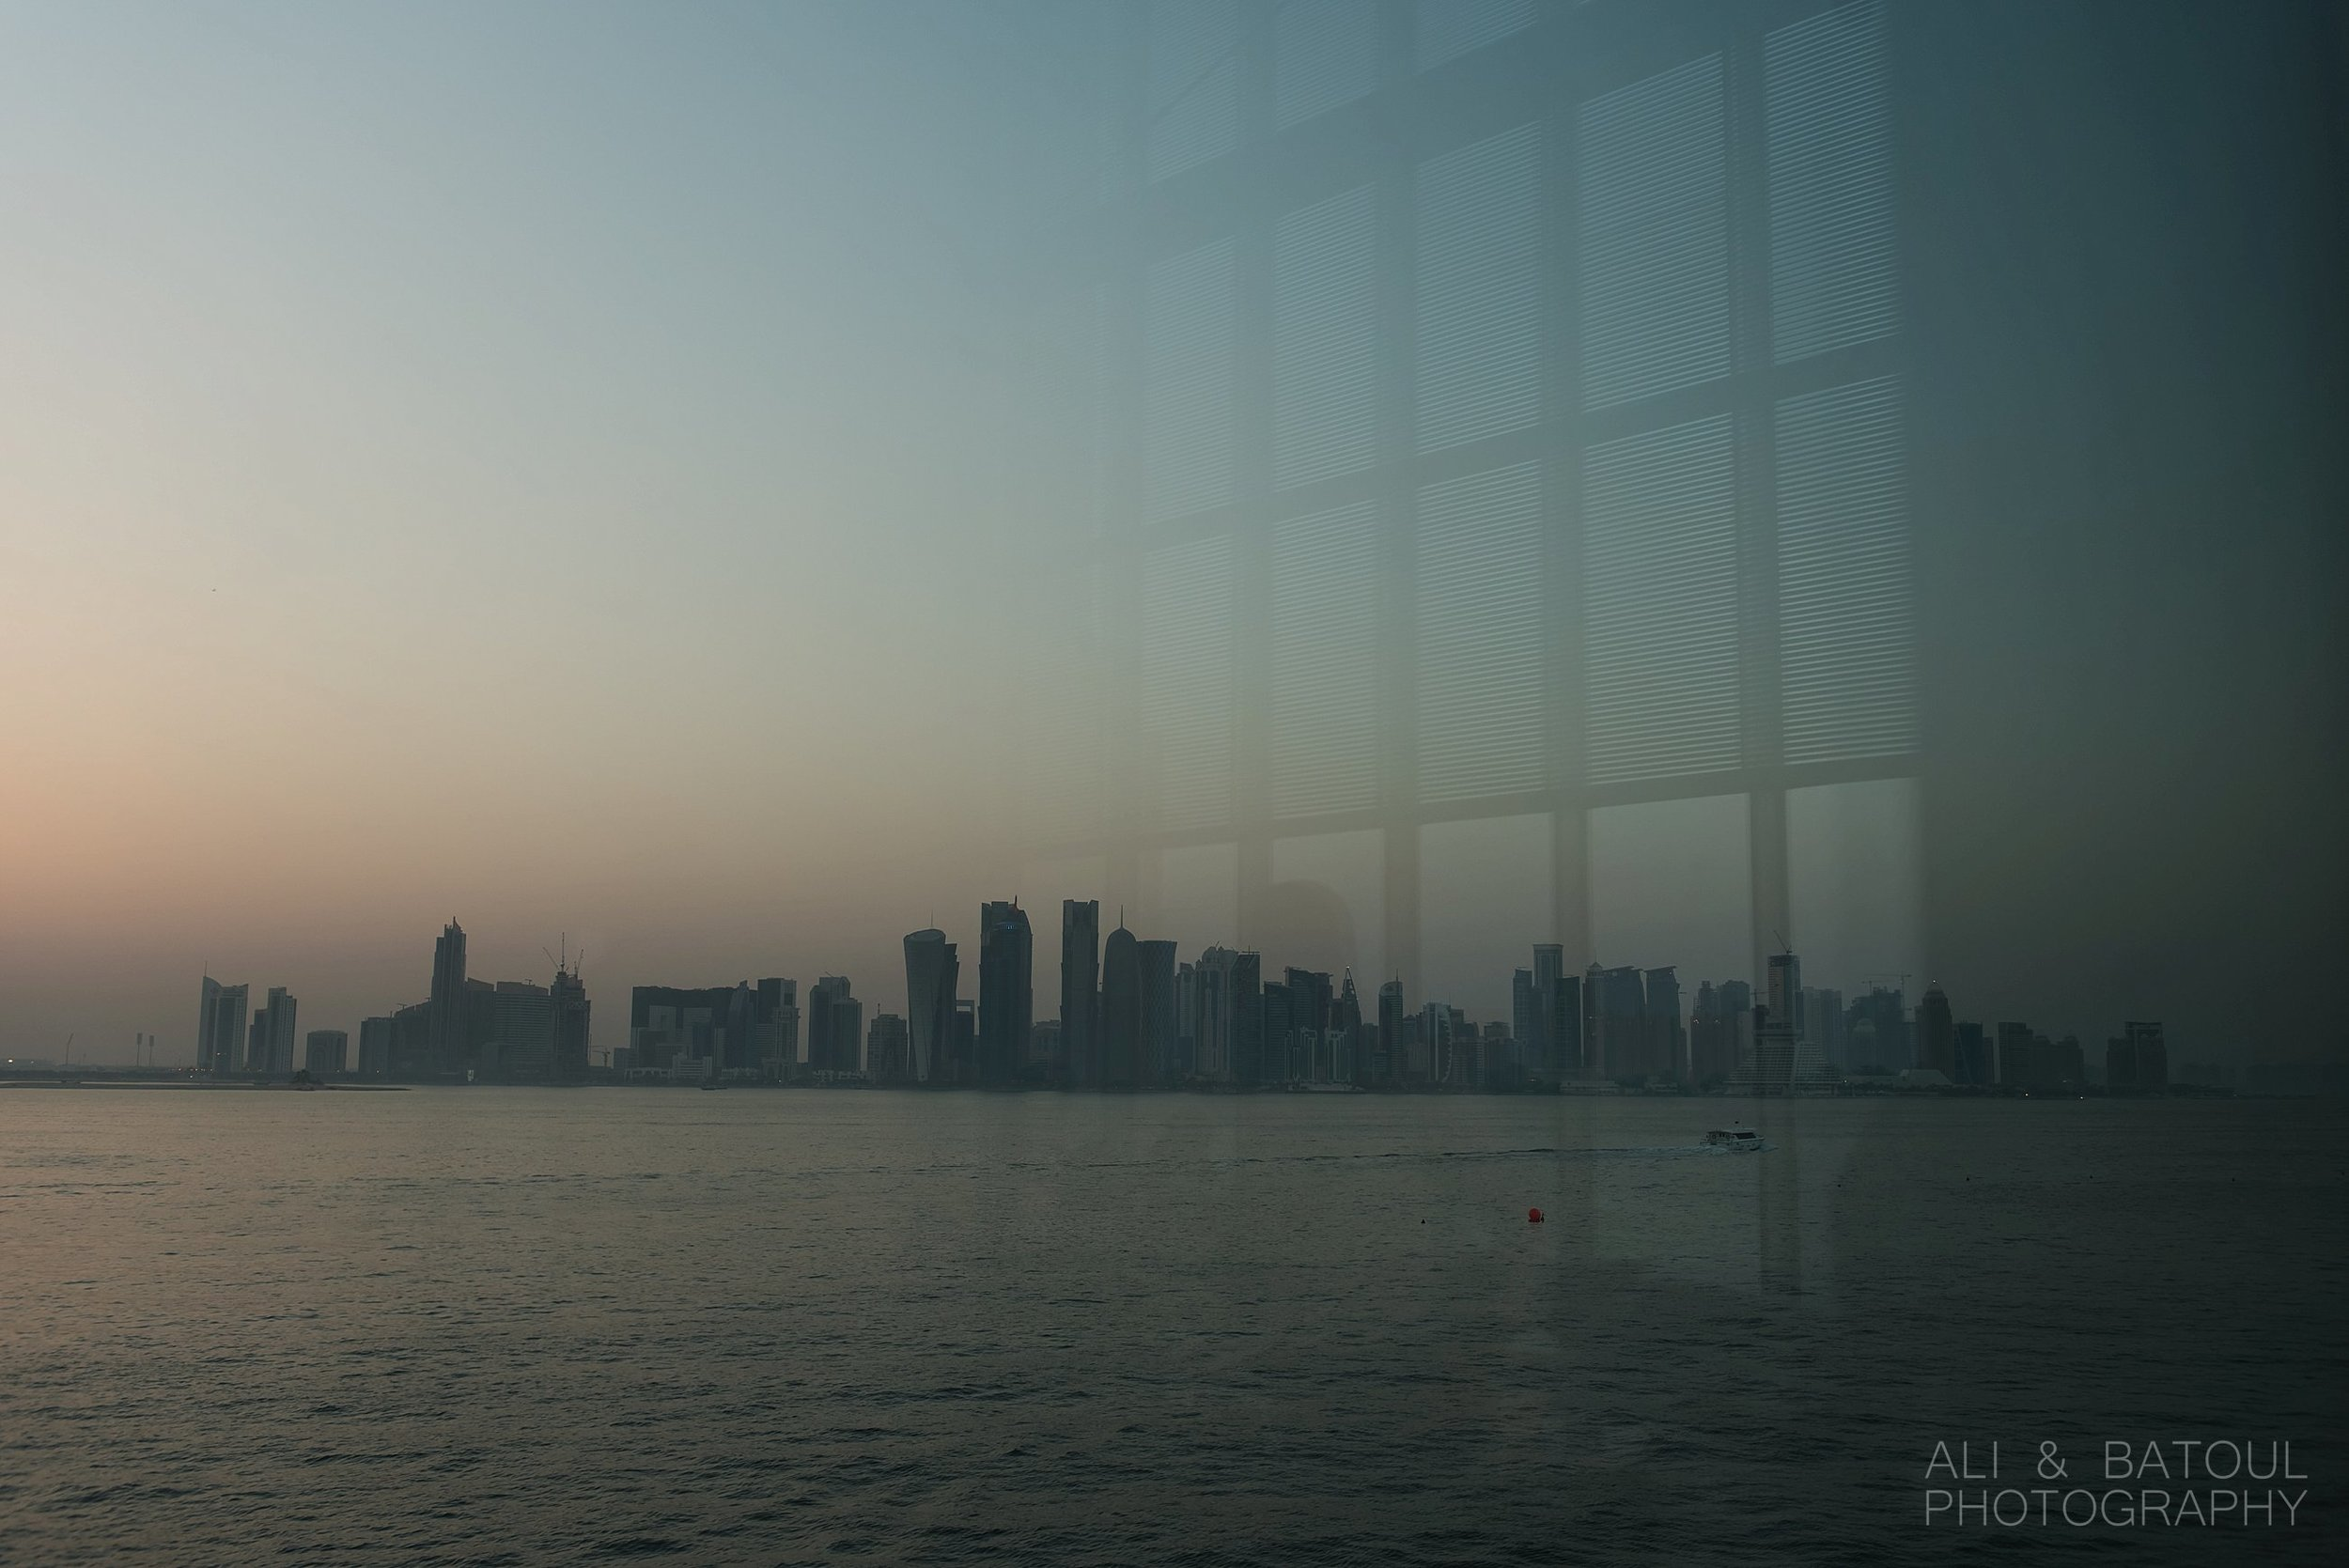 Ali & Batoul Photography - Doha Travel Photography_0007.jpg